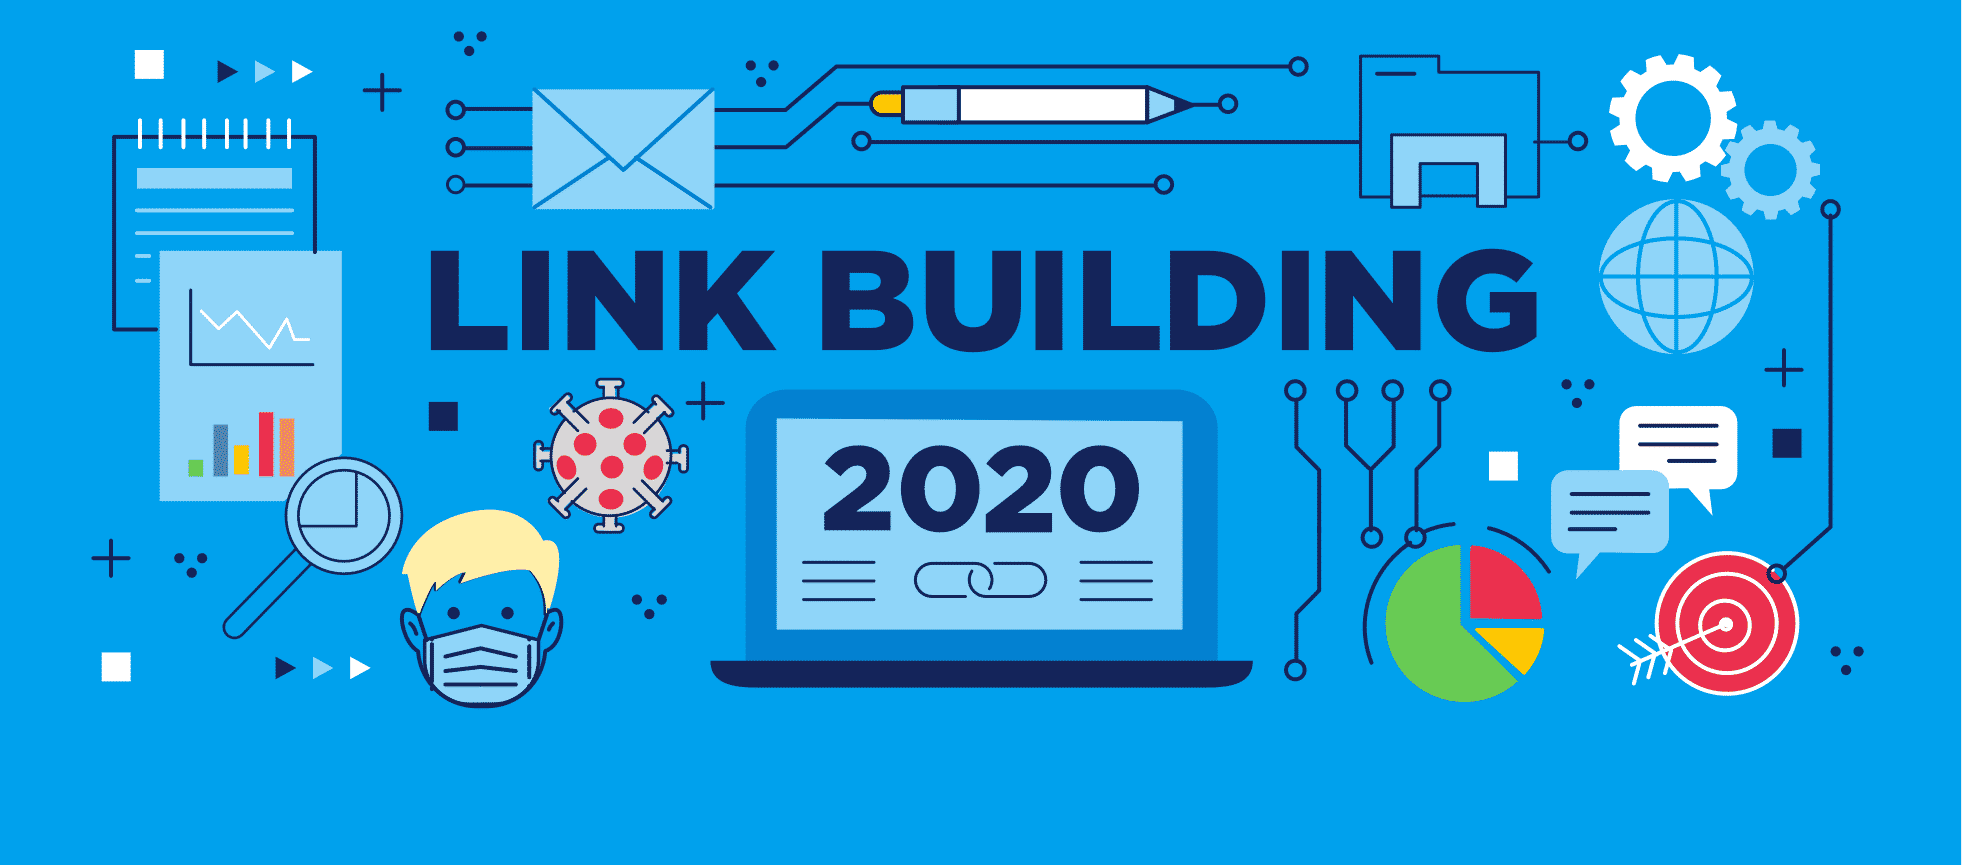 link building survey hero image